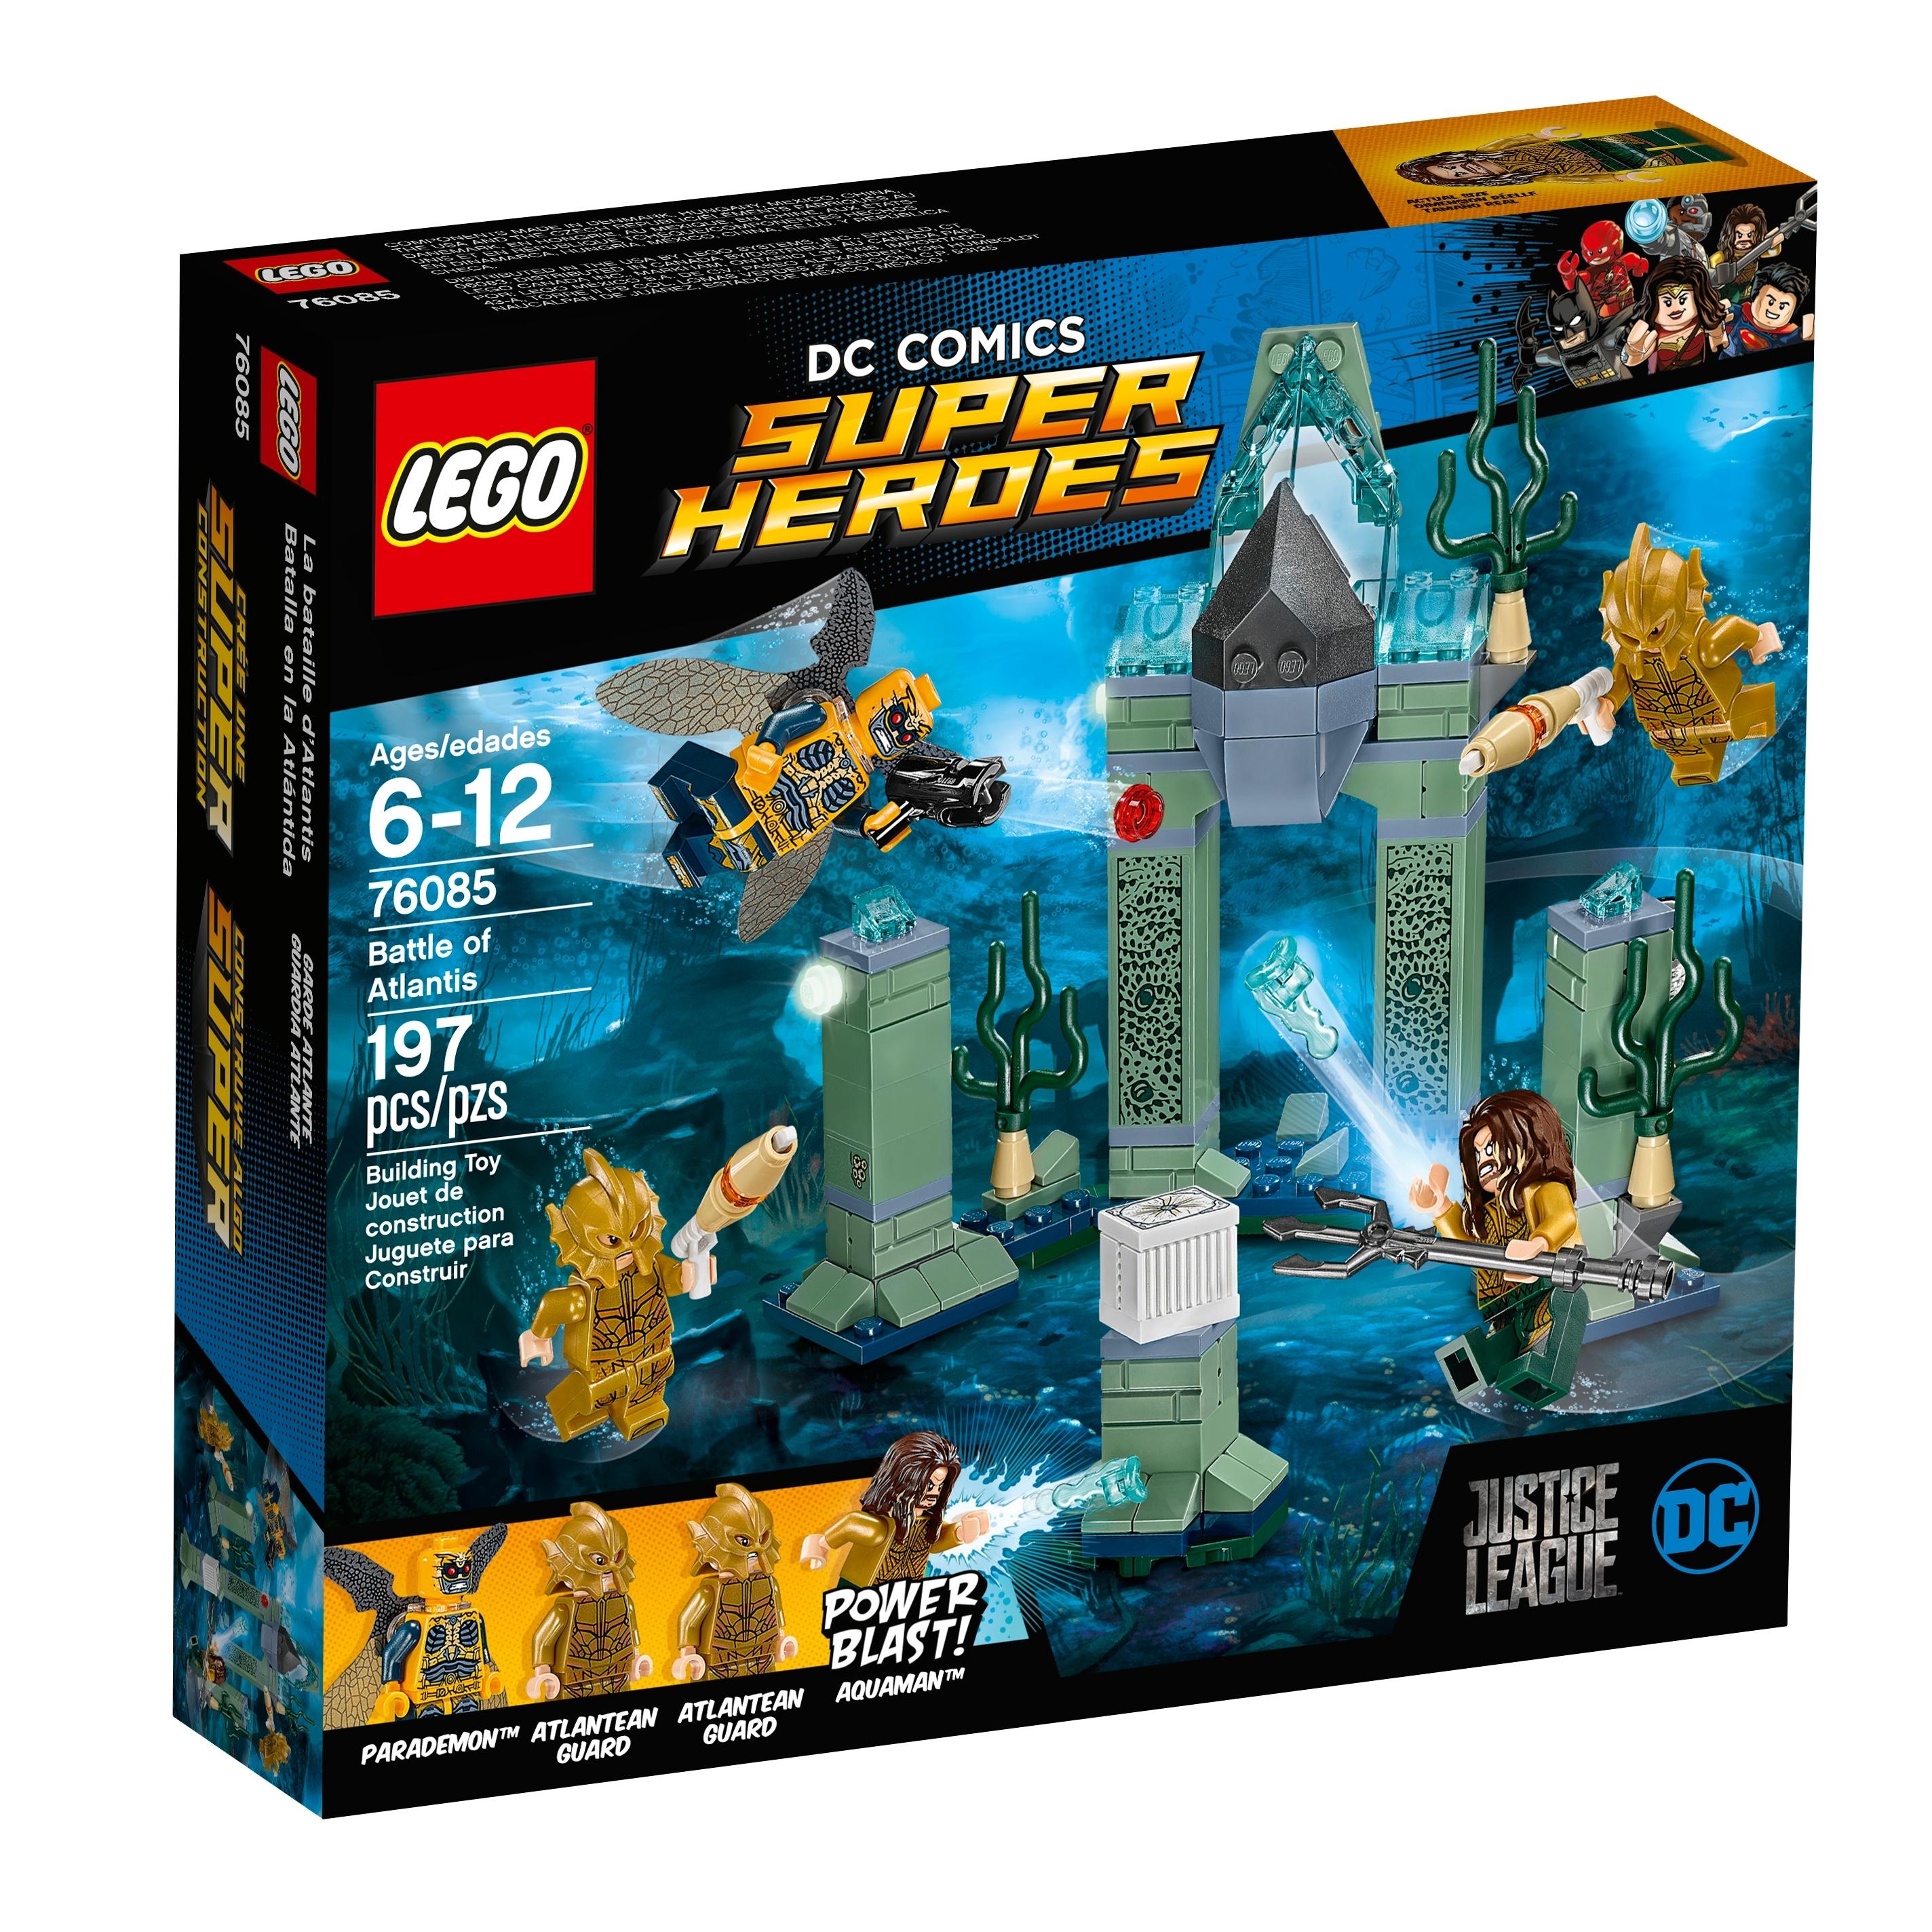 Lego Minifigure Parademon From Set 76085 Battle Of Atlantis Justice League DC